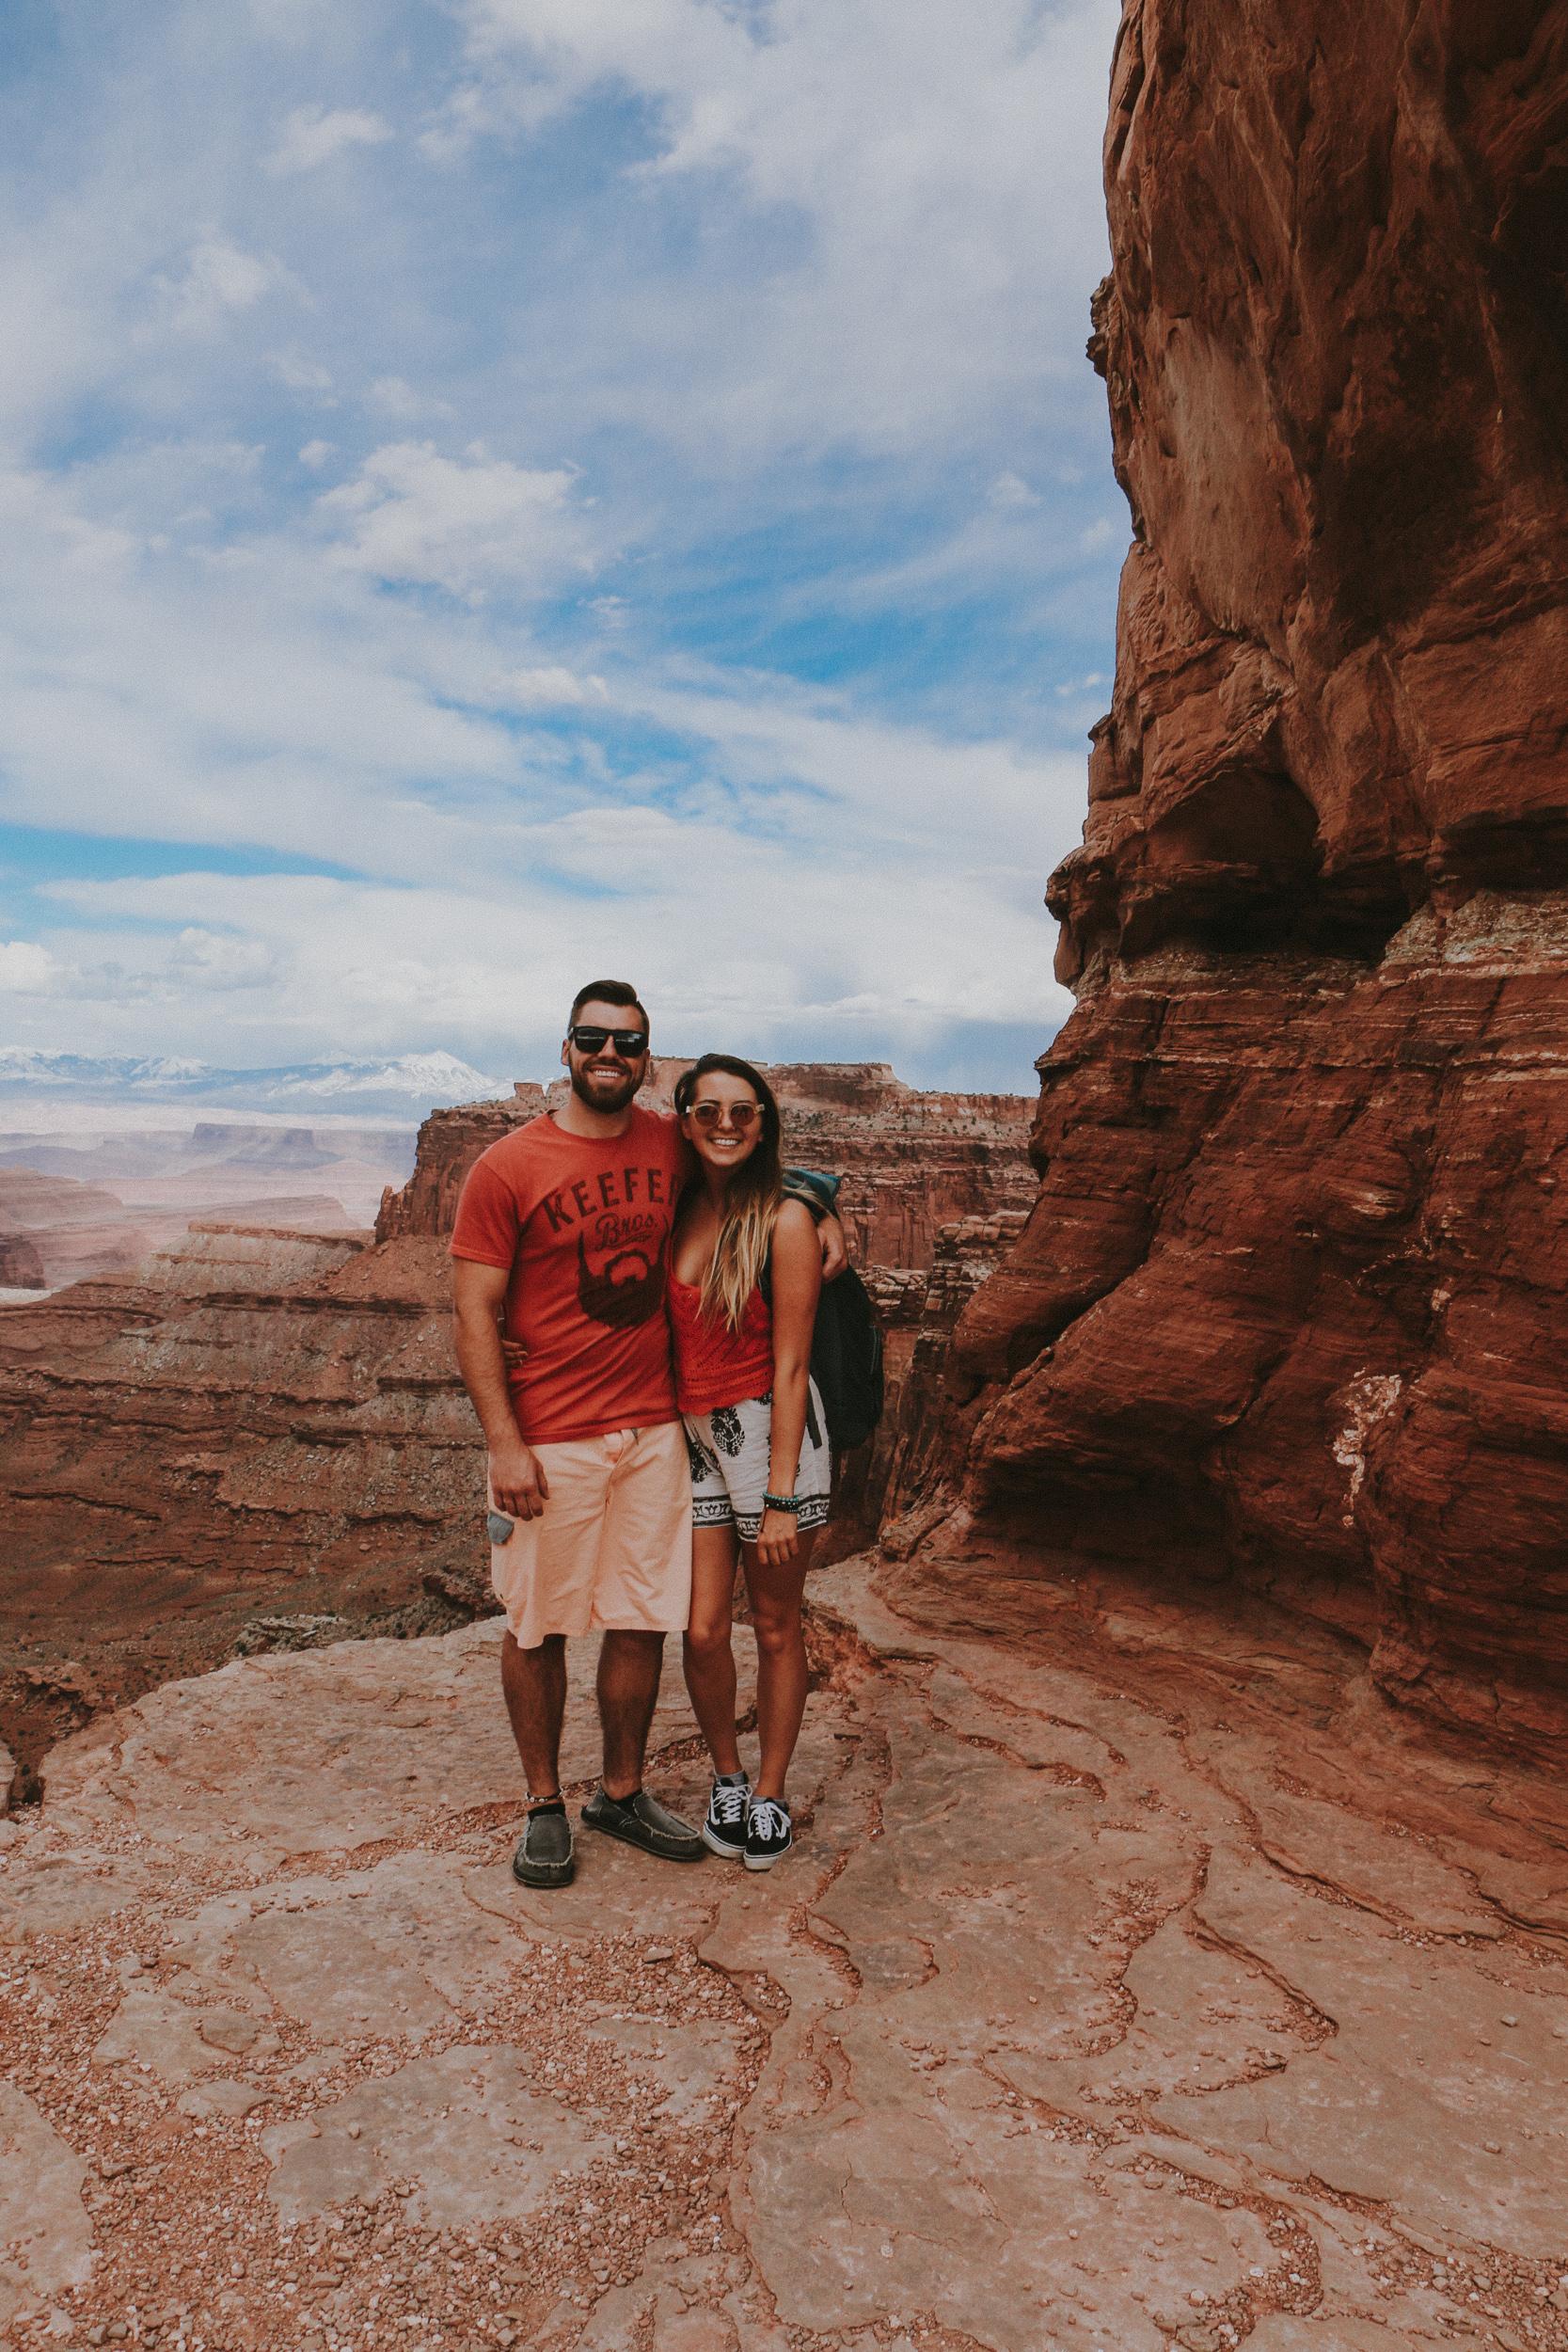 hello adventure co - utah and arizona national parks roadtrip from PNW-2772.jpg